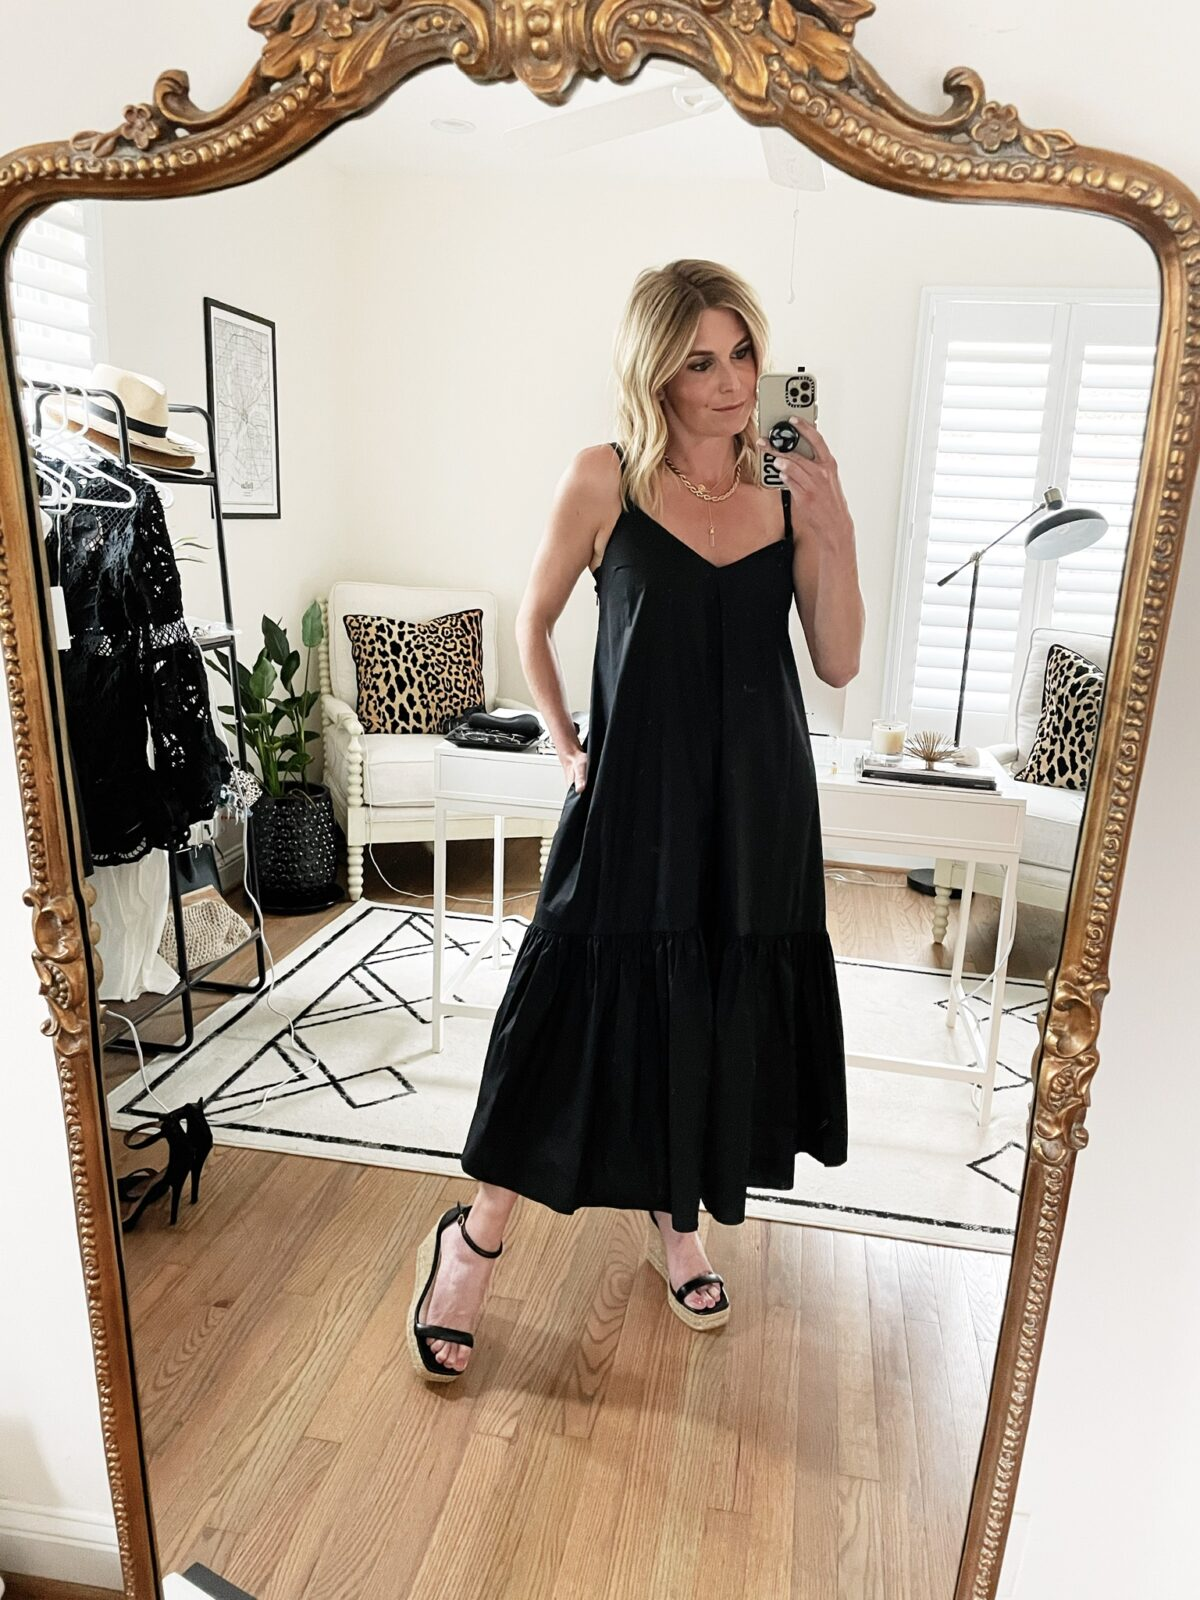 best of june woman taking a selfie and wearing a black dress